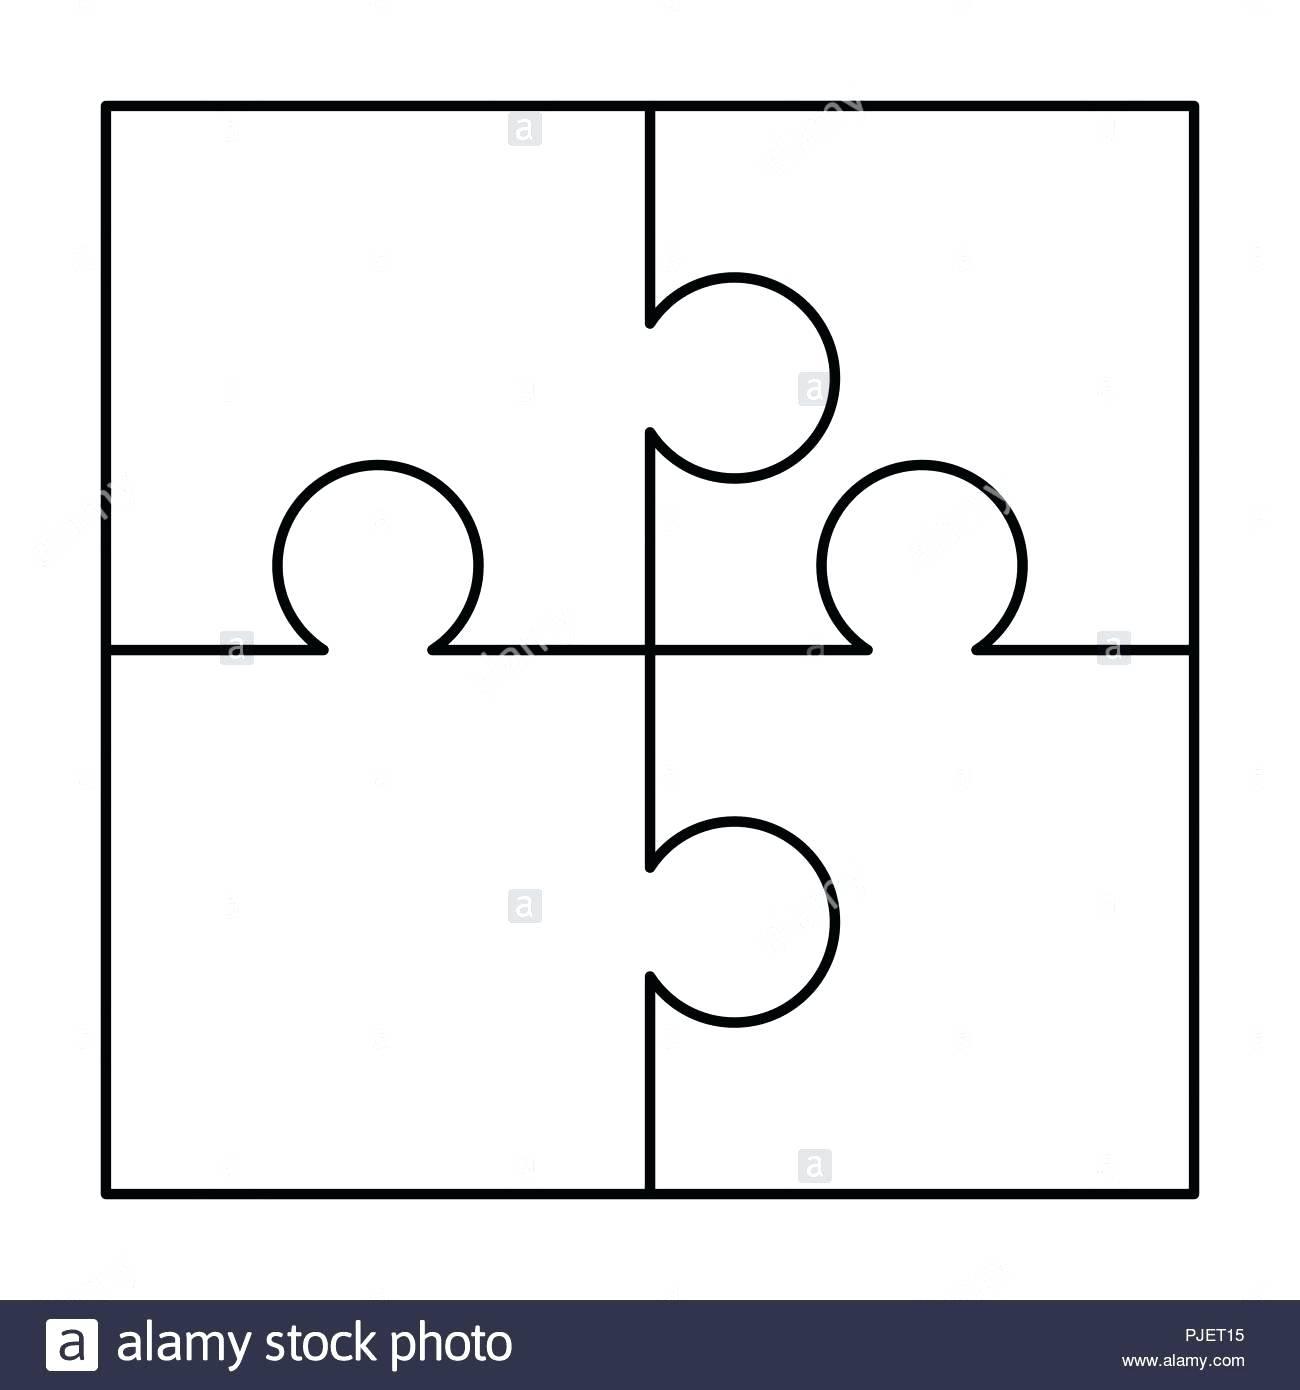 Printable Puzzles Pieces - Yapis.sticken.co - 4 Piece Printable Puzzle